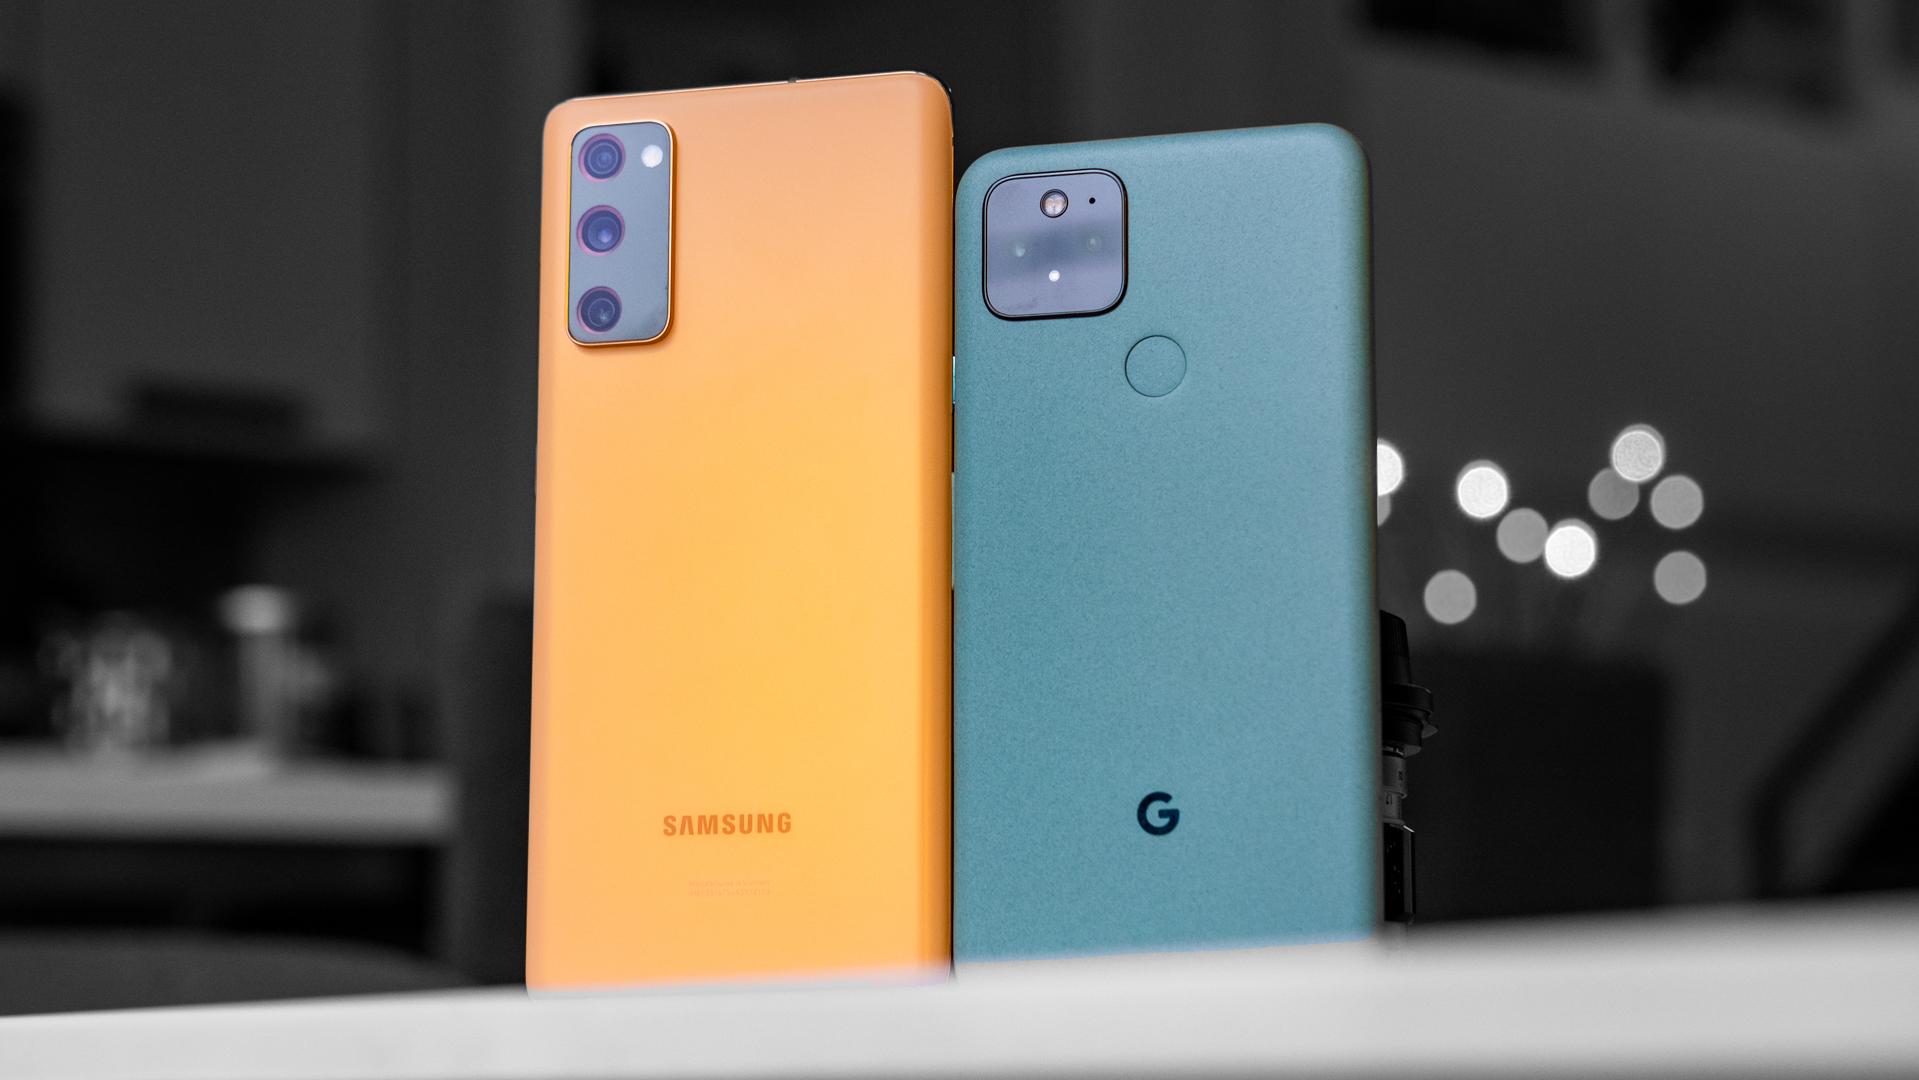 Google Pixel 5 vs Samsung Galaxy S20 FE back